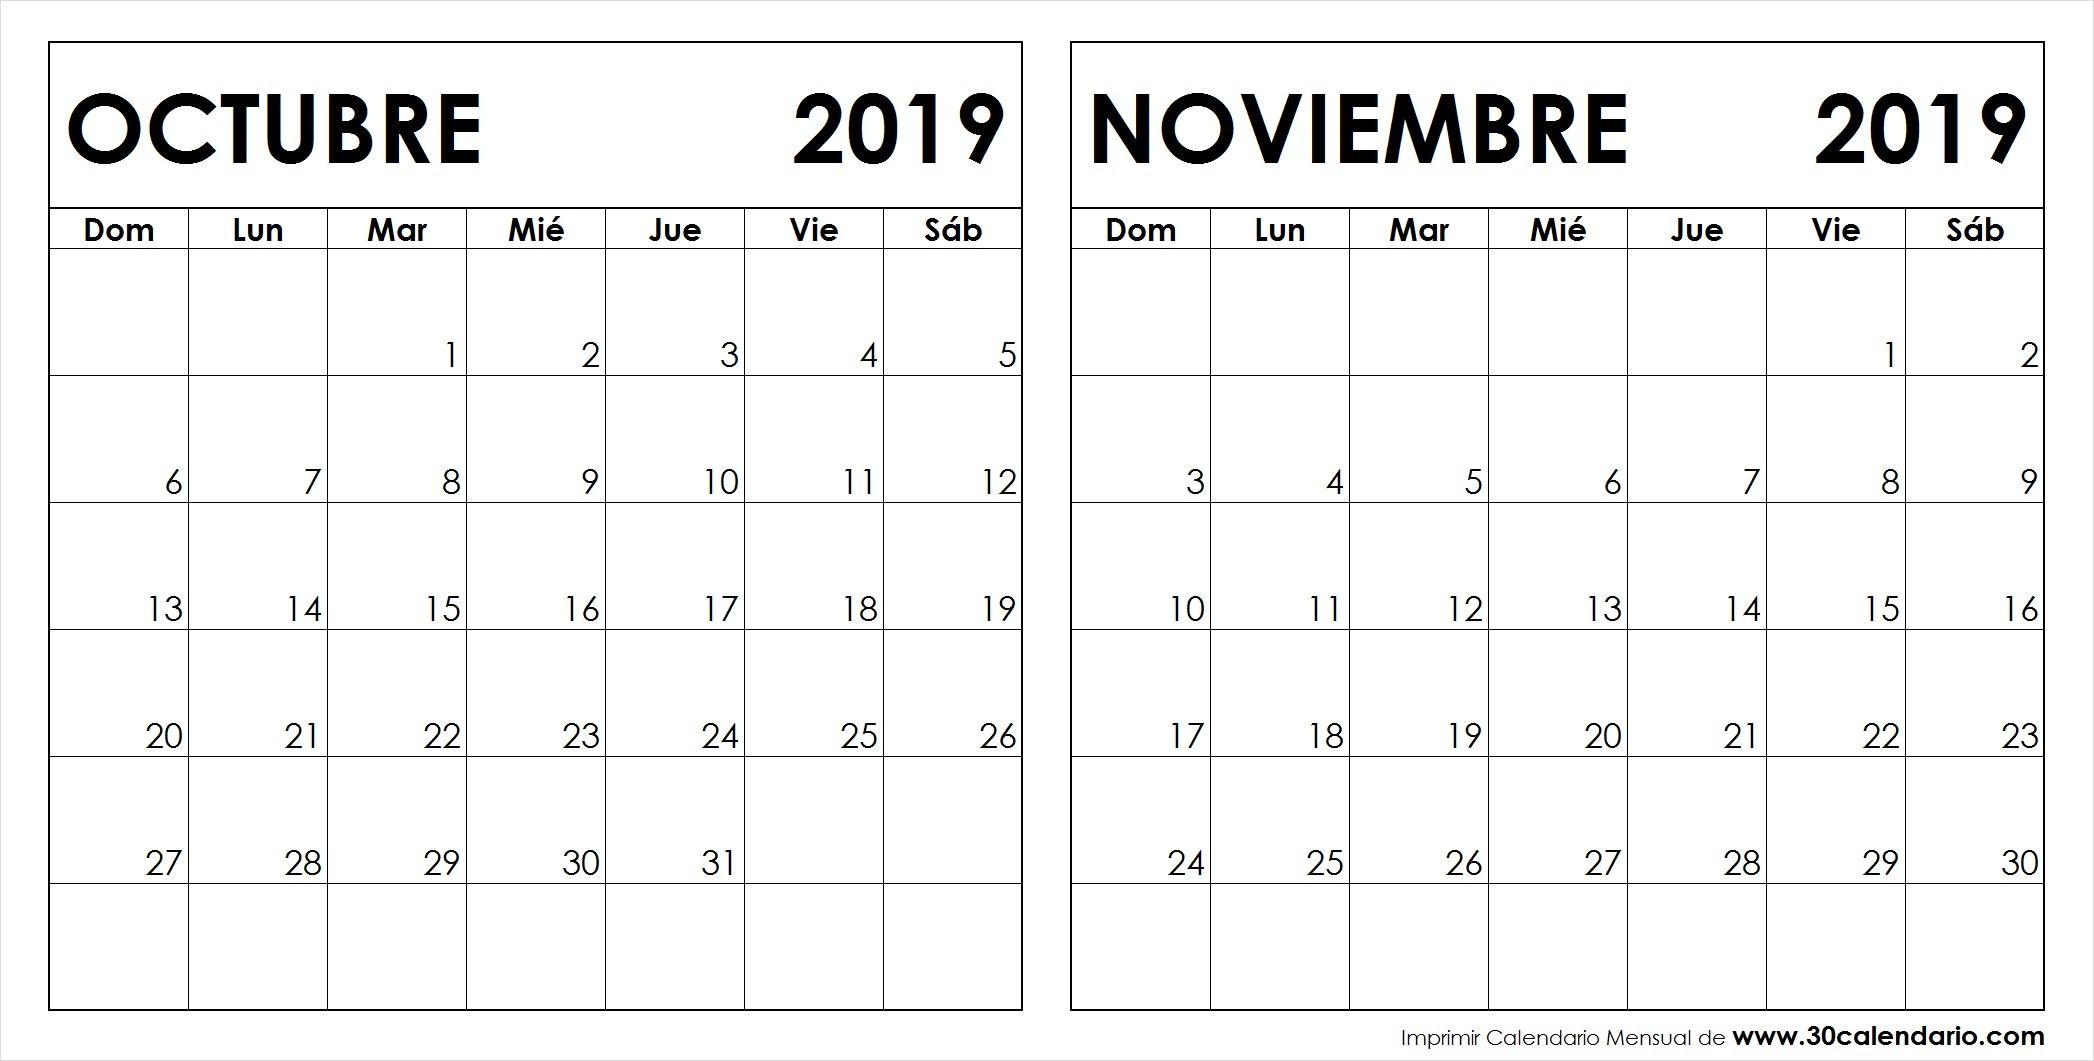 Calendario Octubre Noviembre 2019 Para Imprimir